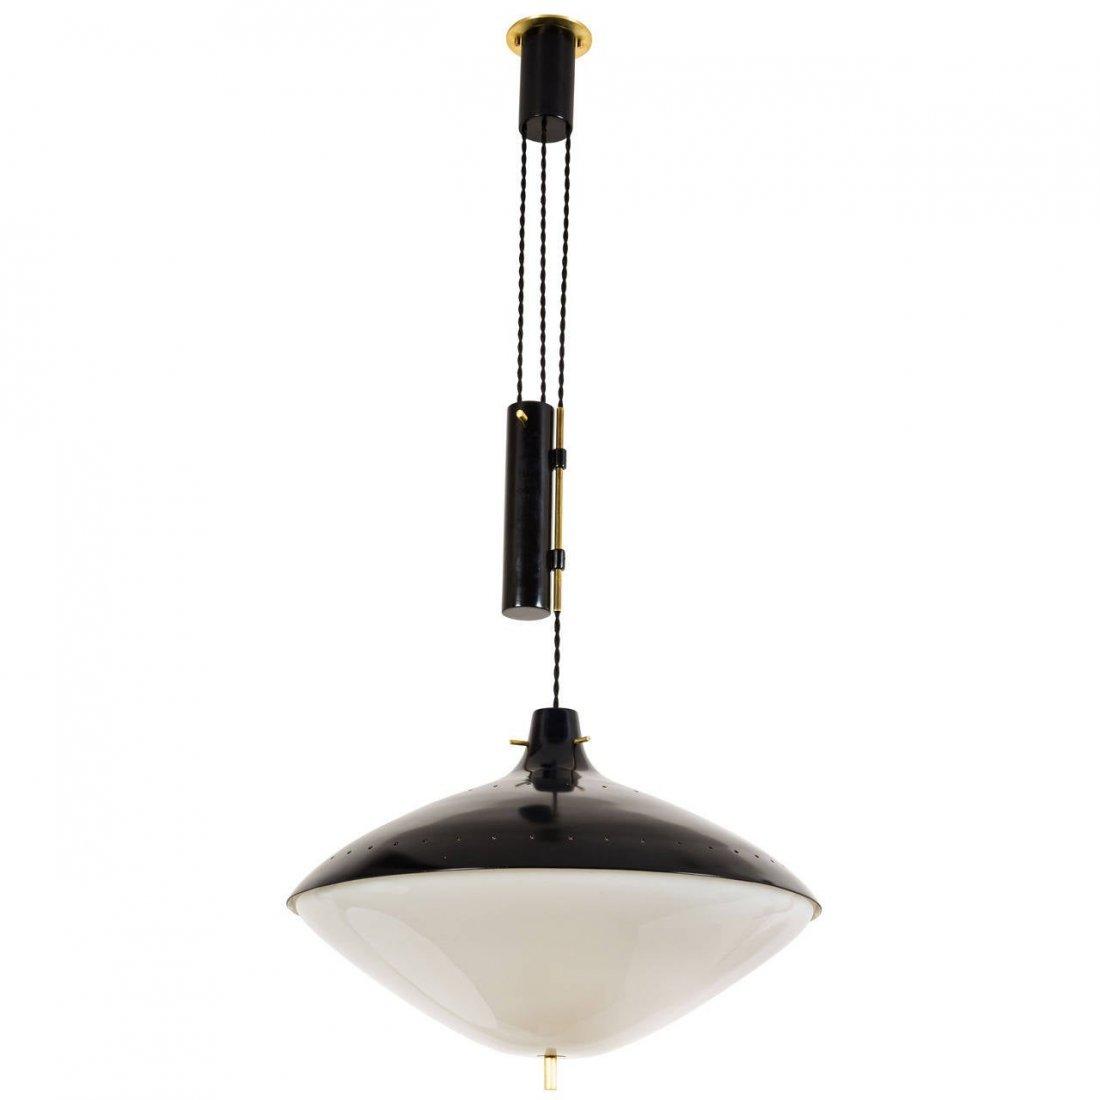 Italian Pulley Lamp